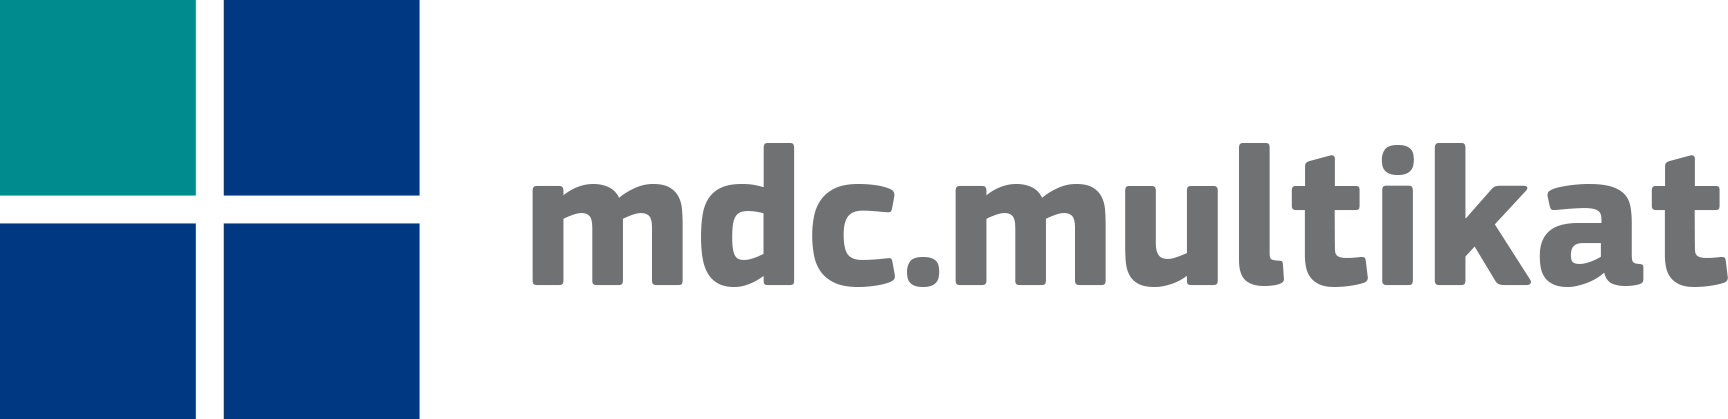 mdc.multikat Logo lang